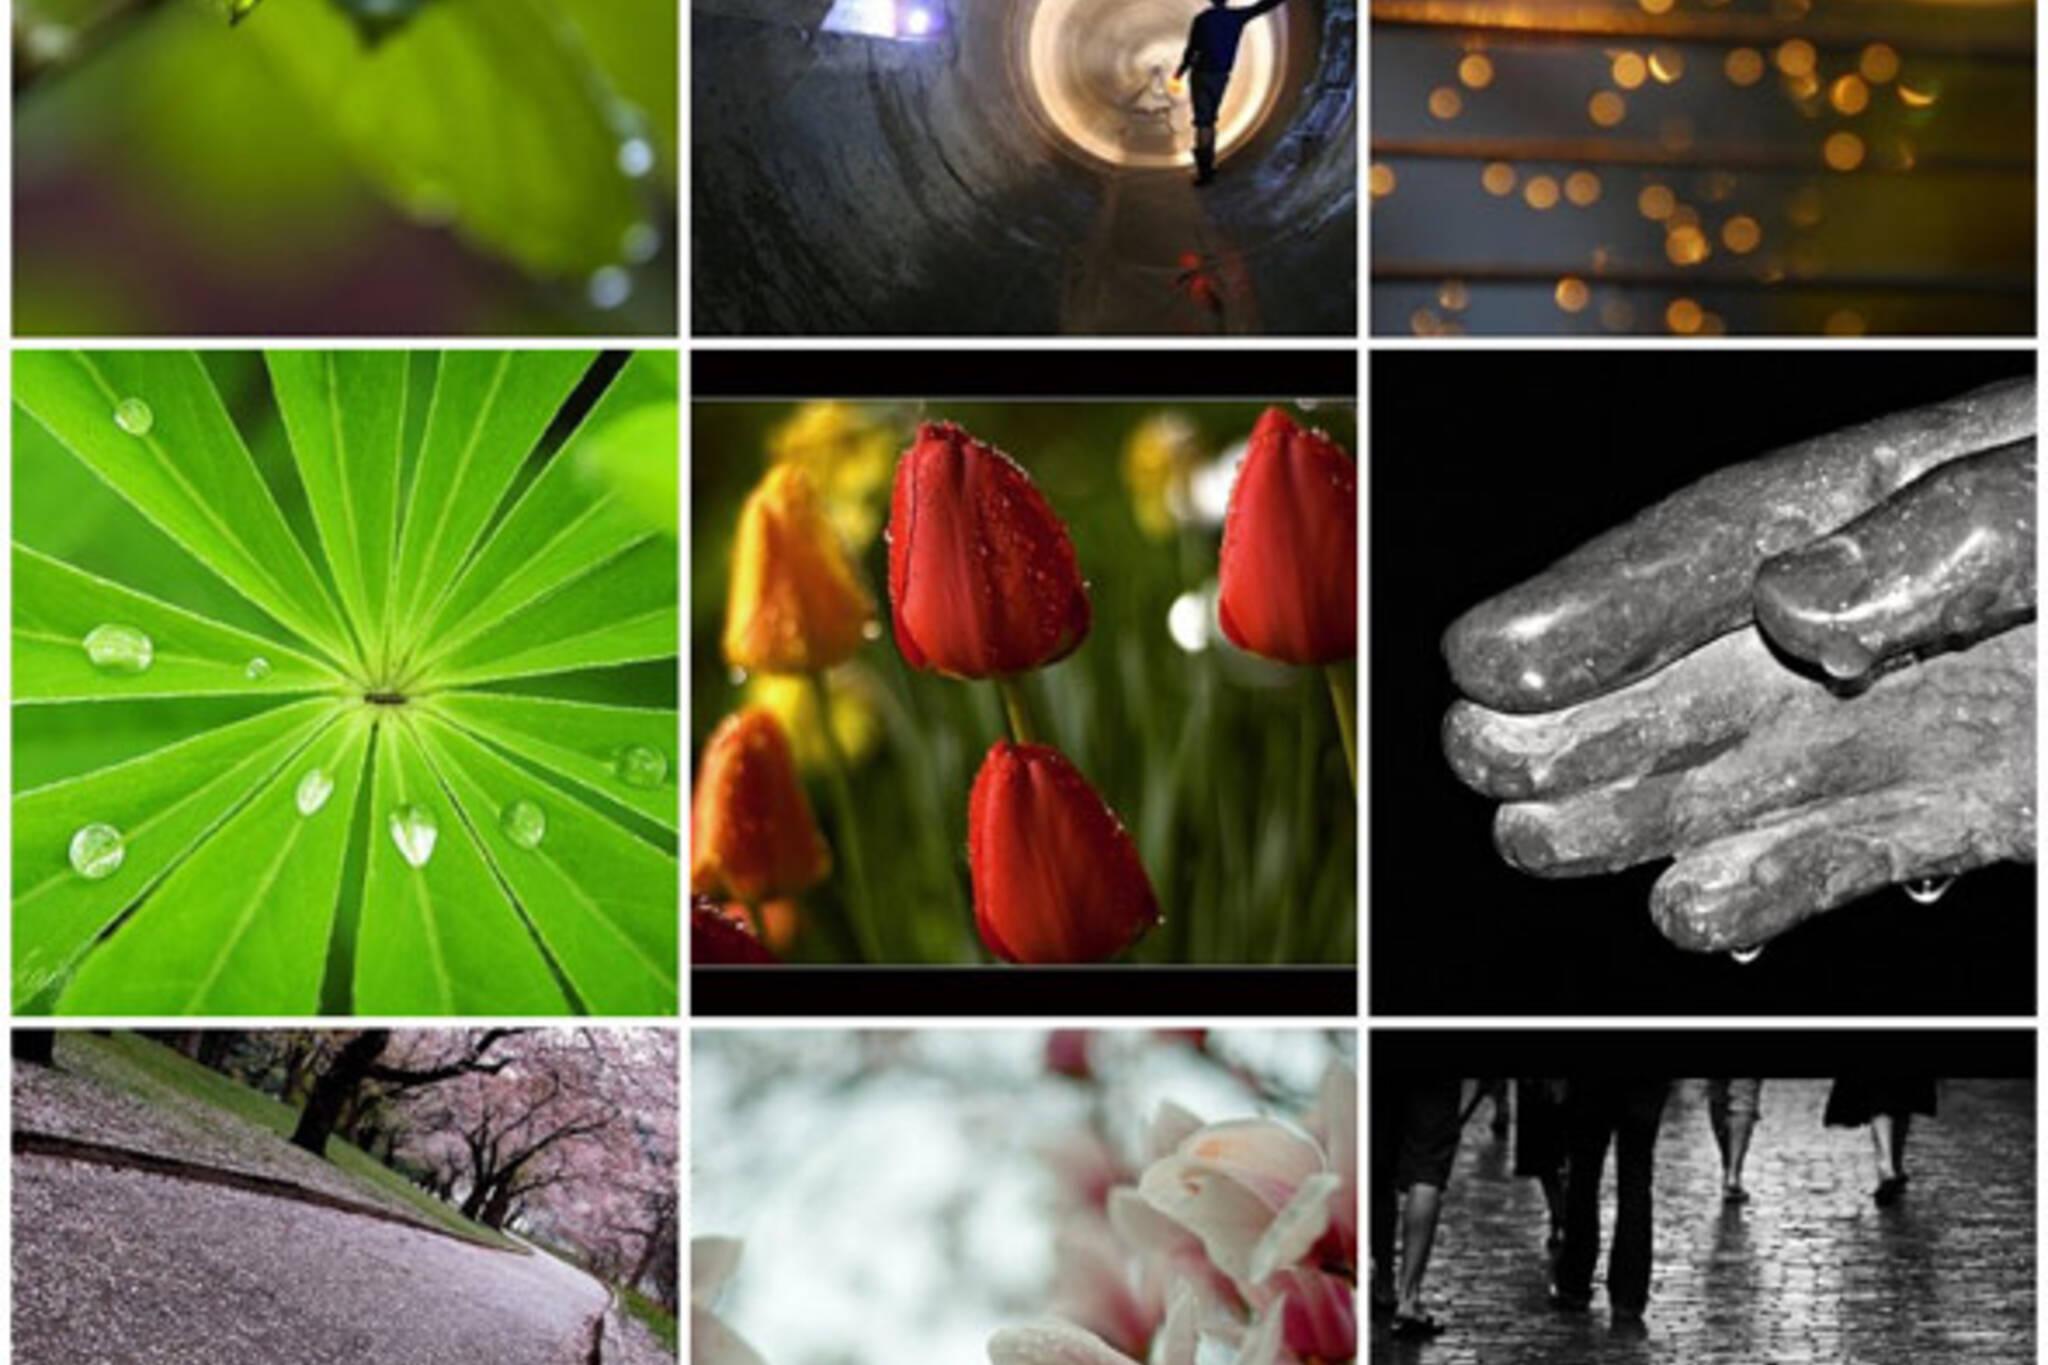 Flickr Forum: May 16th, 2008 - Rain